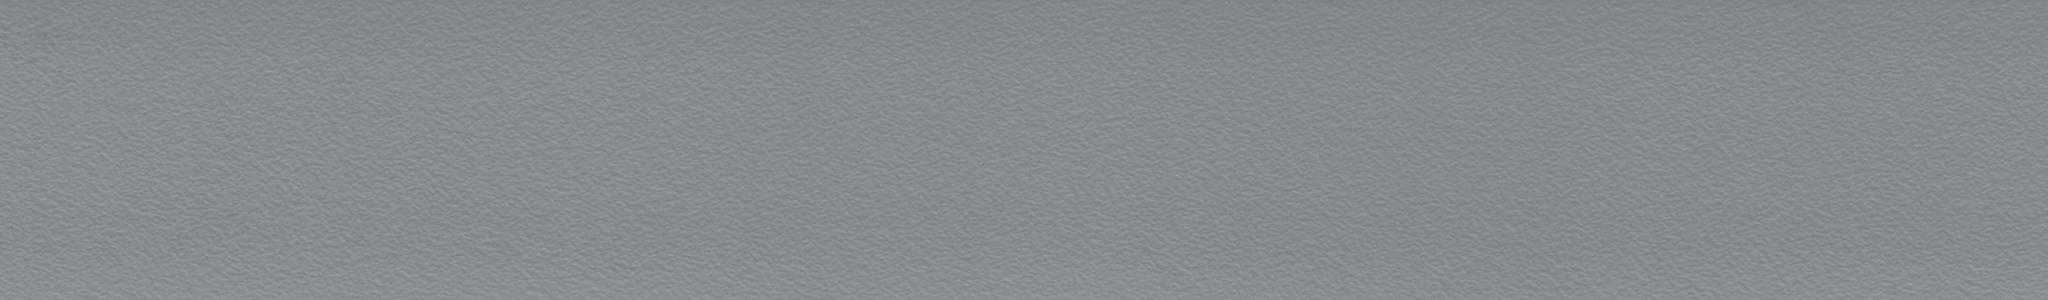 HU 17960 кромка ABS серая оникс жемчуг XG